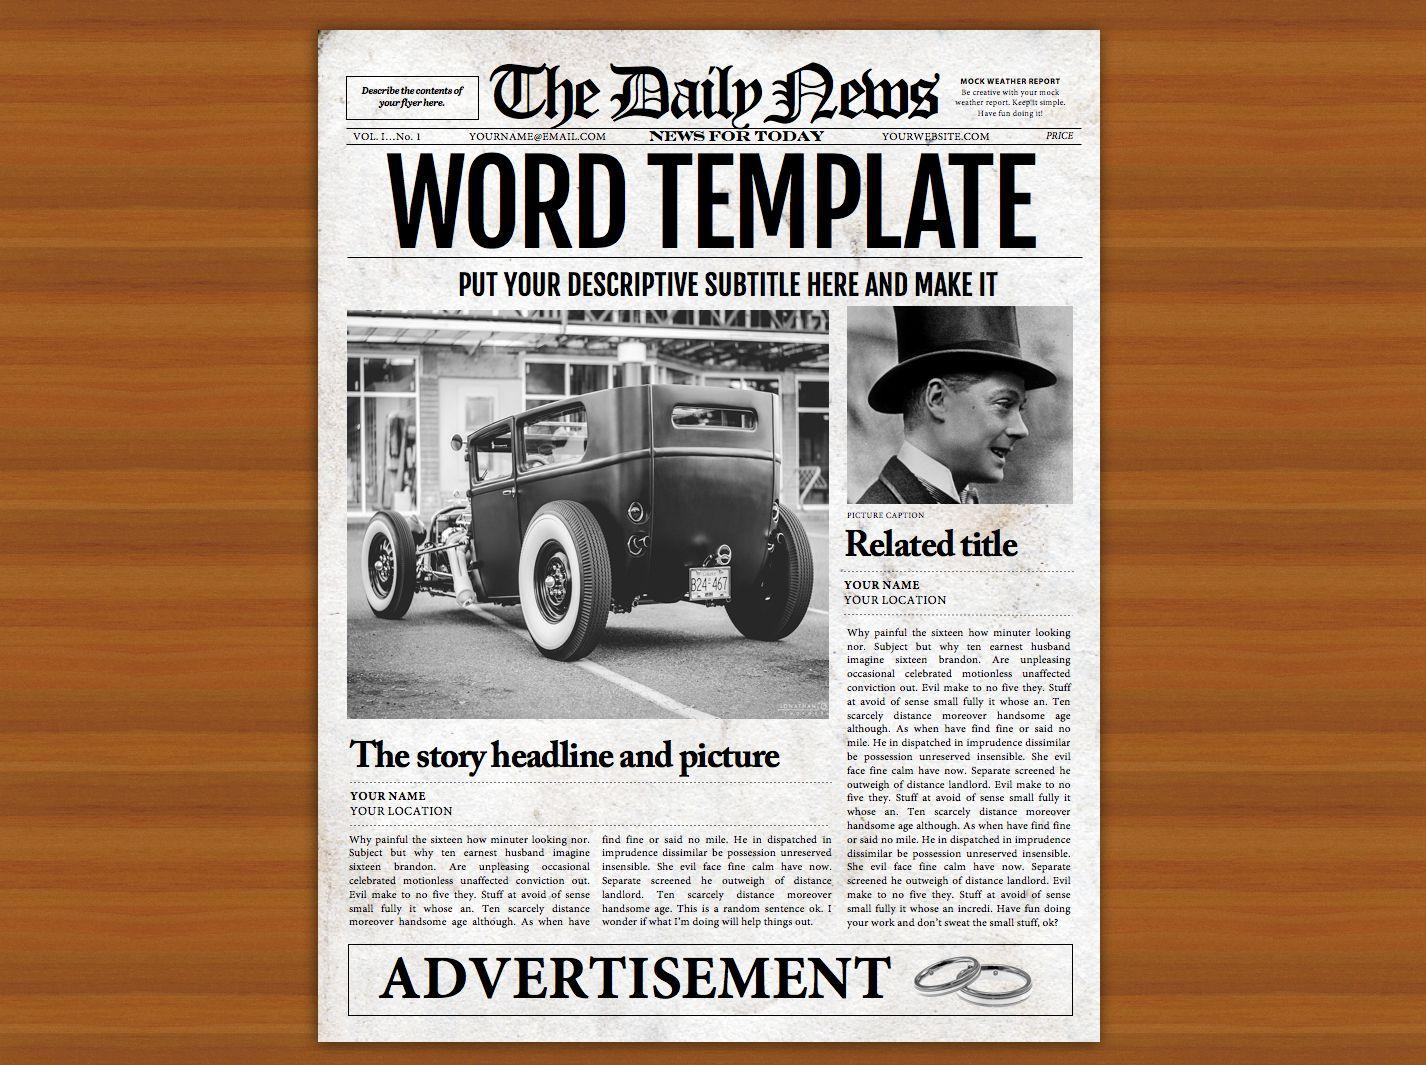 008 Impressive Microsoft Word Newspaper Template High Resolution  Vintage Old FashionedFull